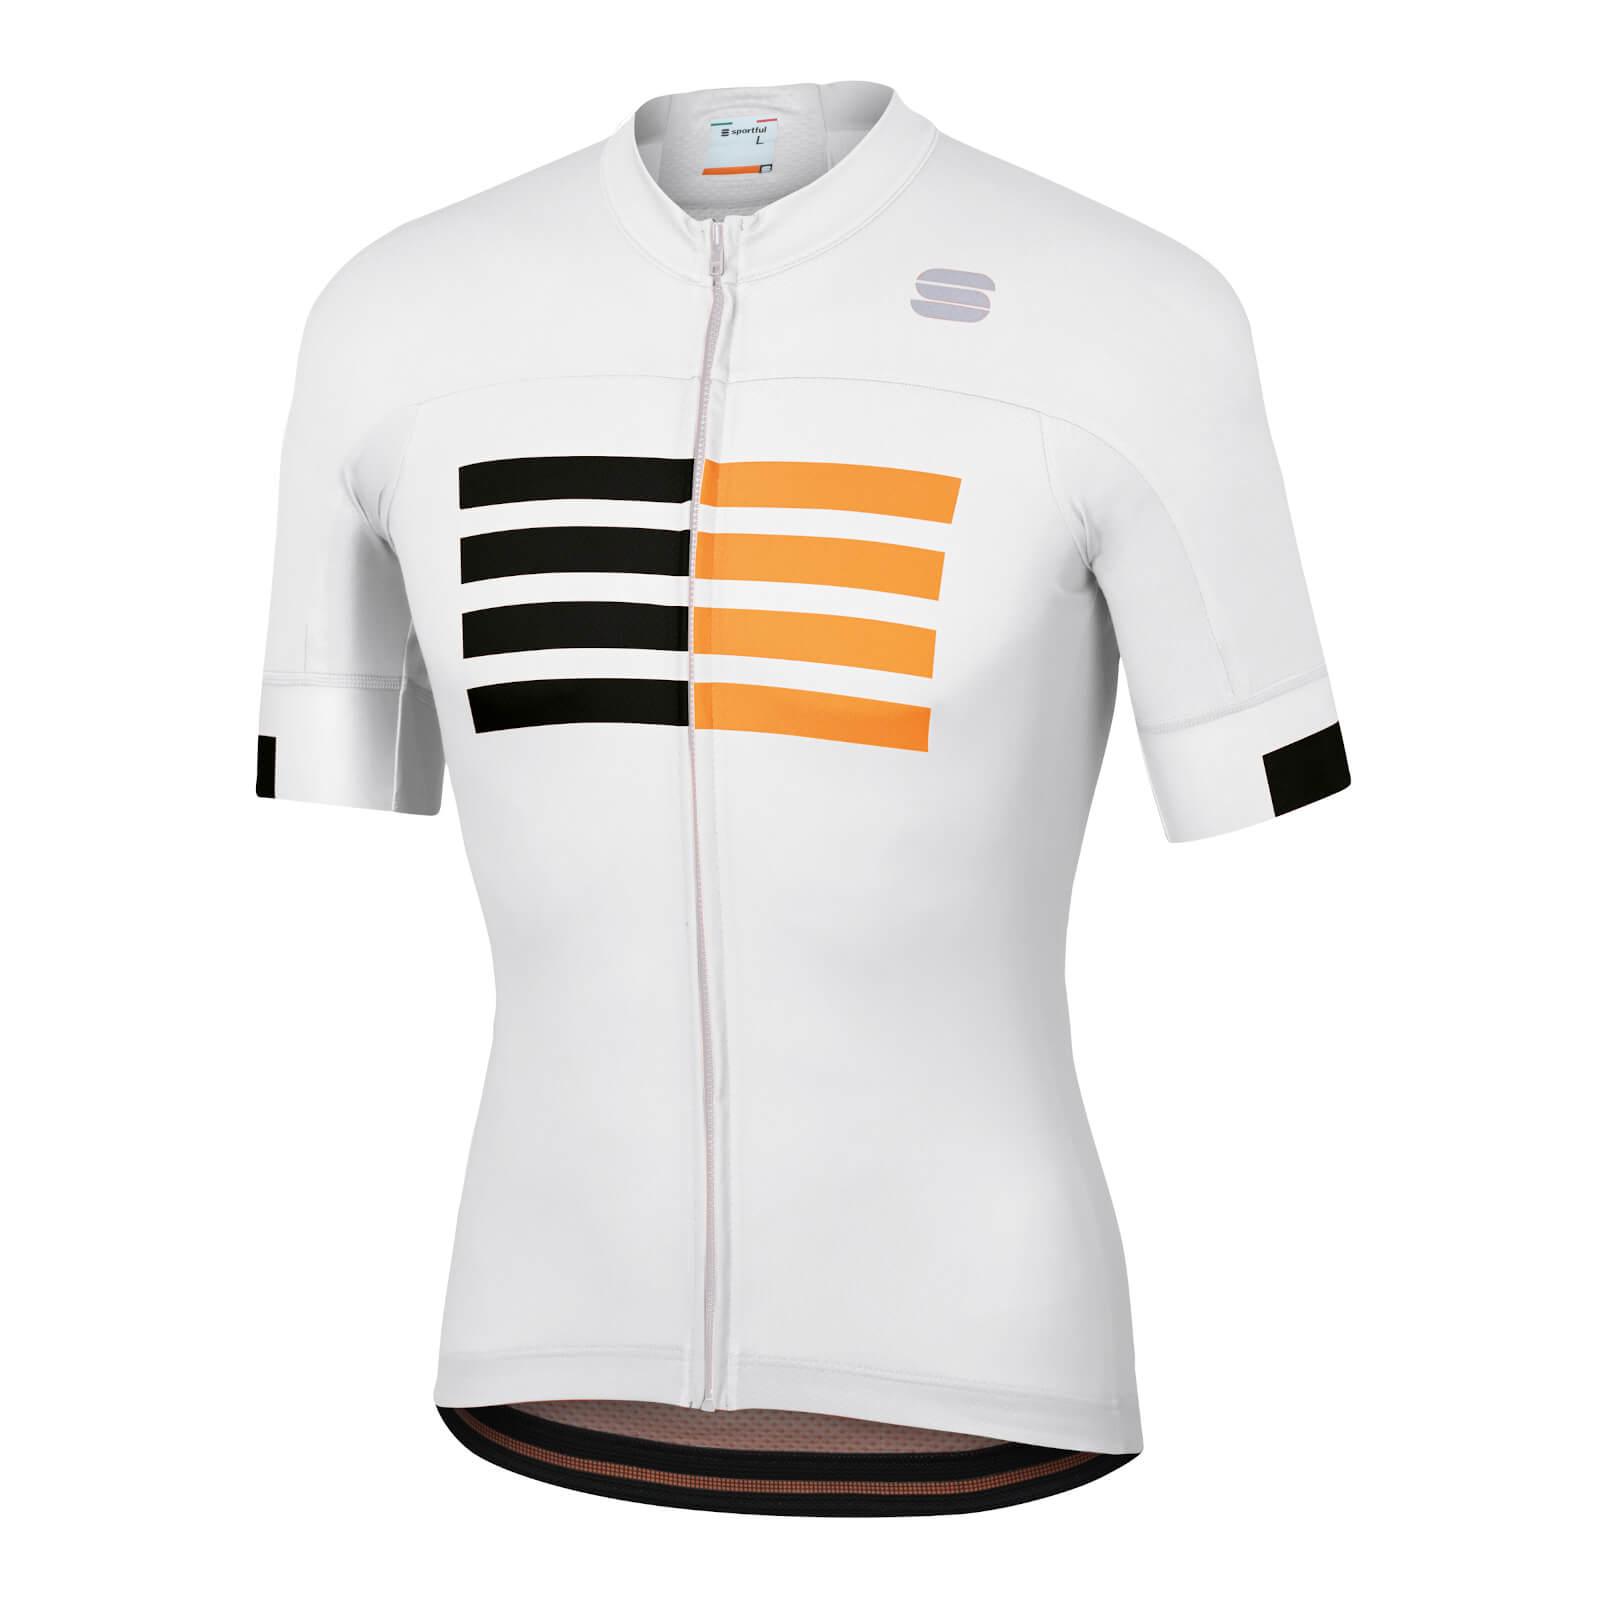 Sportful Wire Jersey - XL - White/Black/Gold